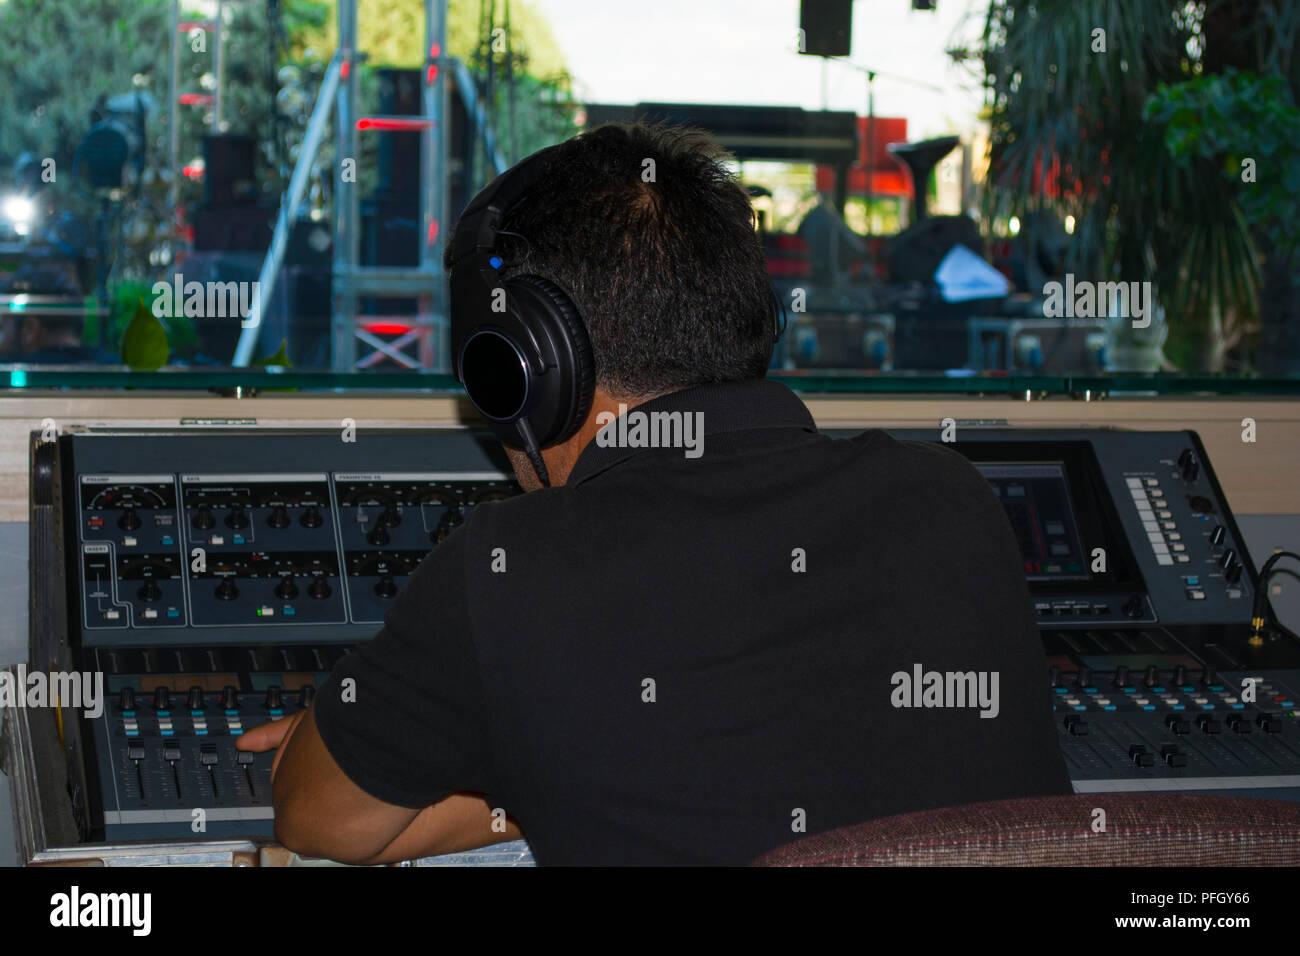 man stage sound mixer at sound engineer hand using audio mix